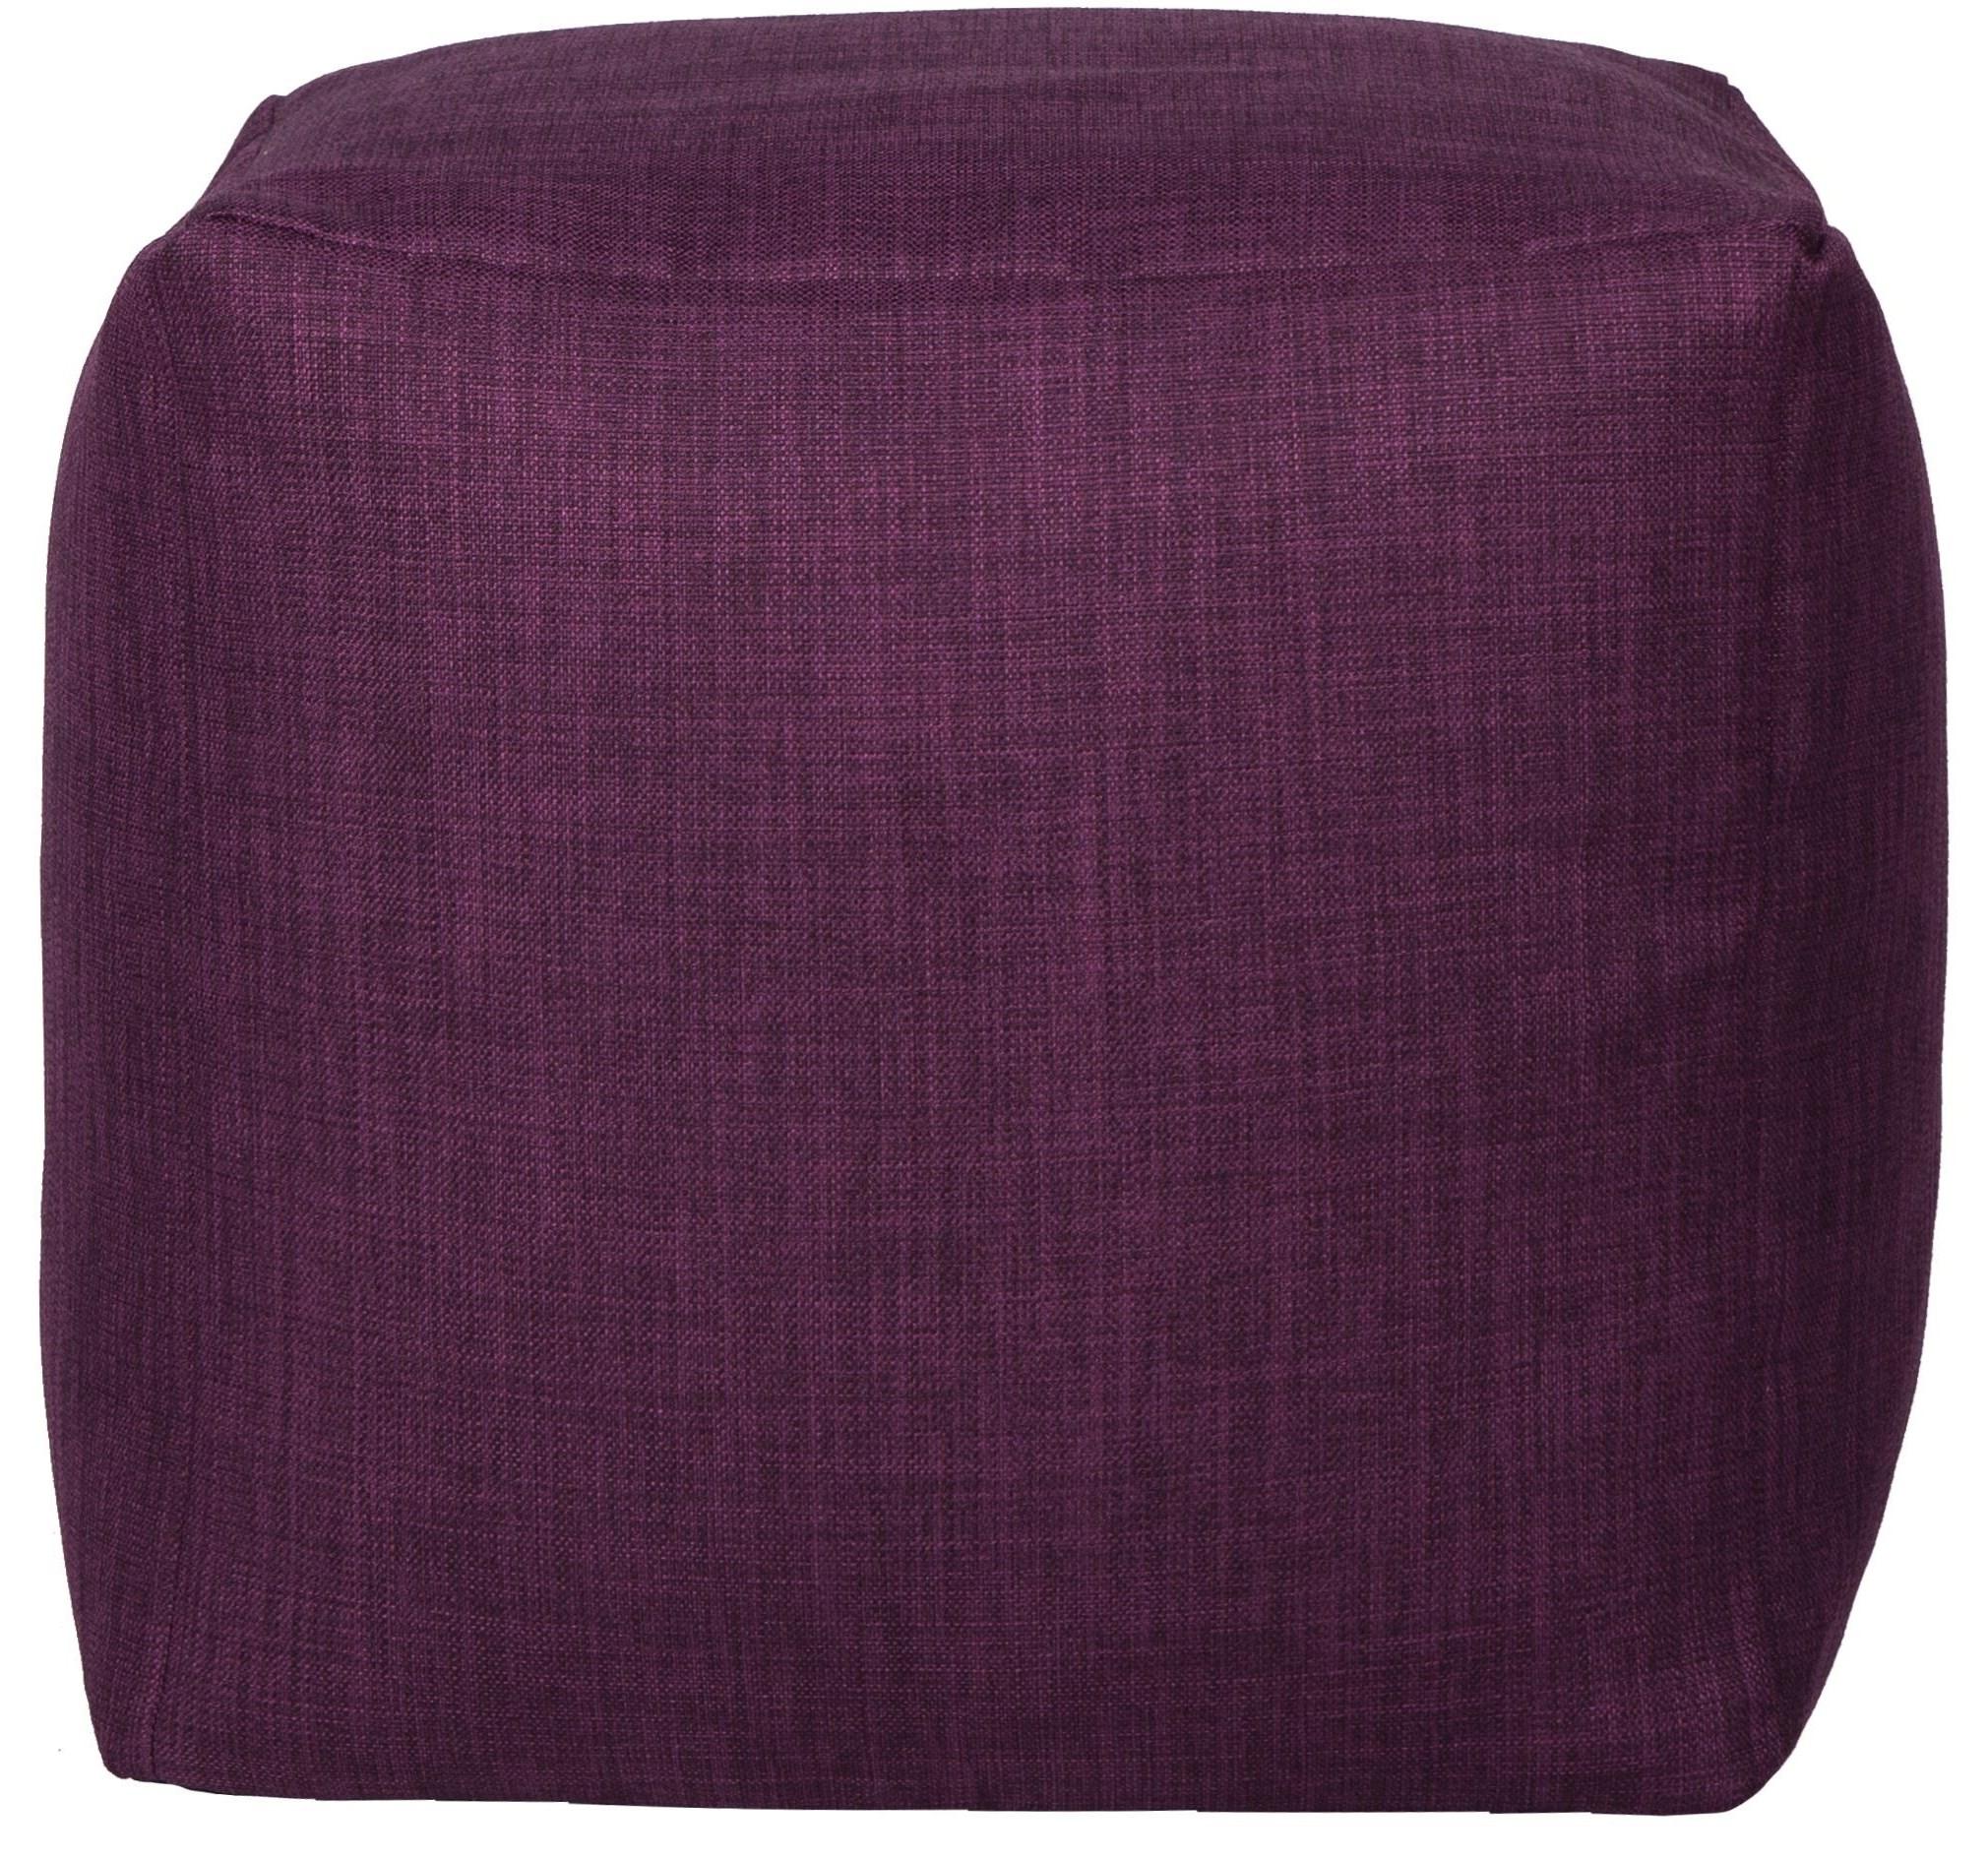 Beanbag Canvas Purple Cube Beanbag by Lazy Life Paris at HomeWorld Furniture